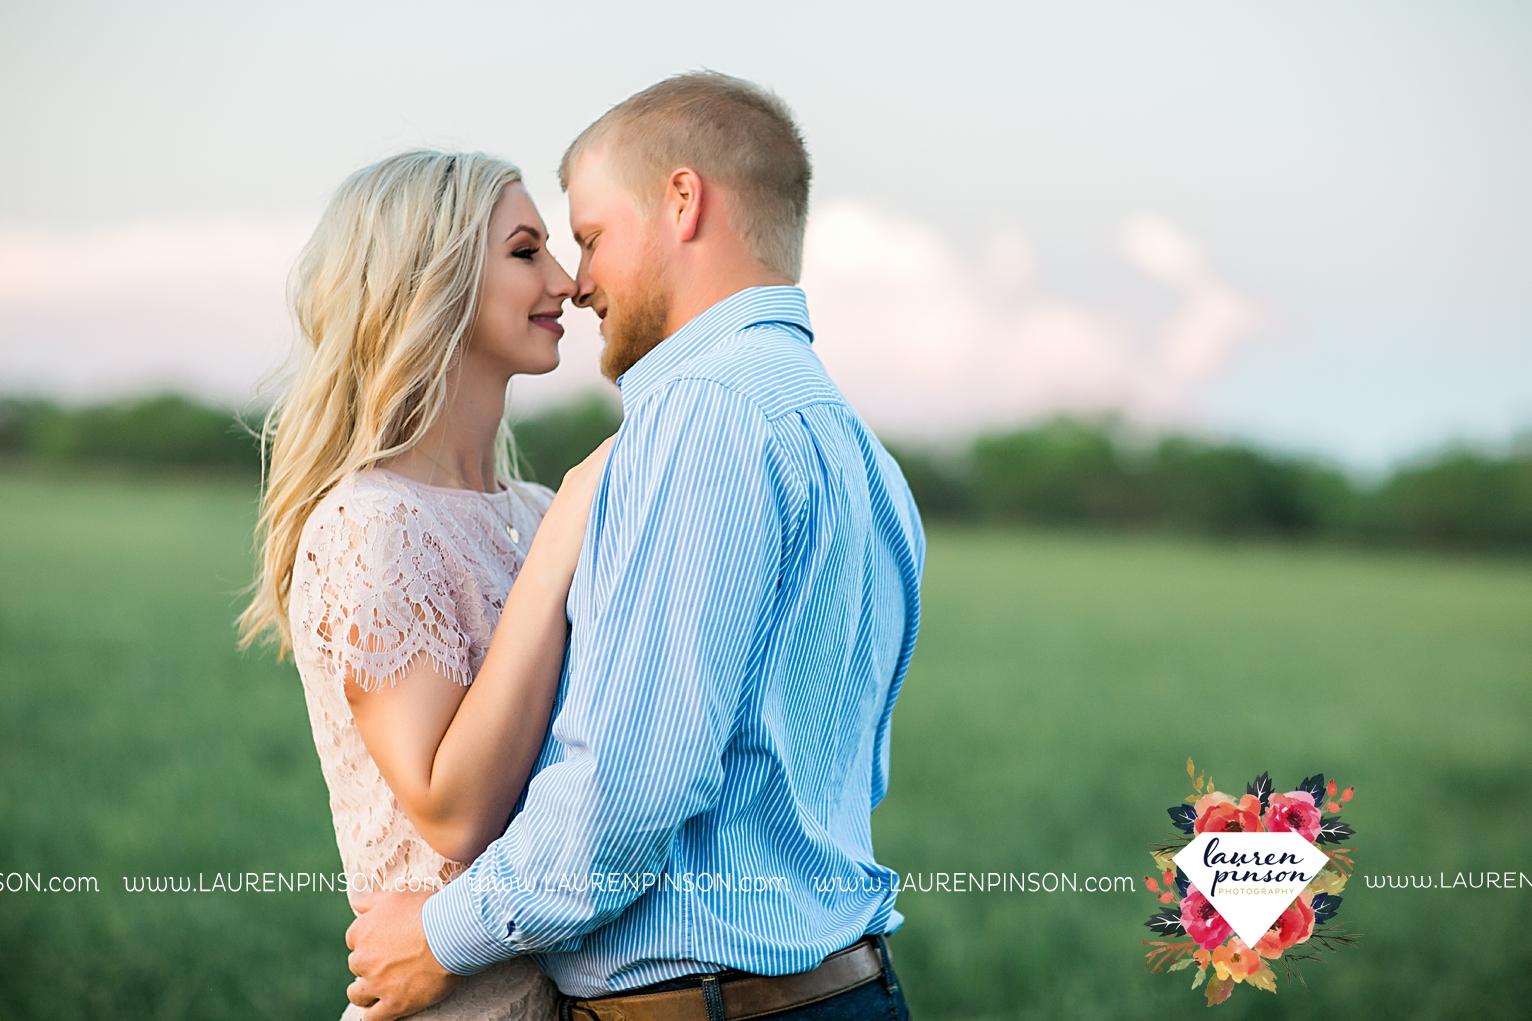 wichita-falls-texas-wedding-photographer-scotland-texas-engagement-session-country-barn-field-windthorst_2777.jpg